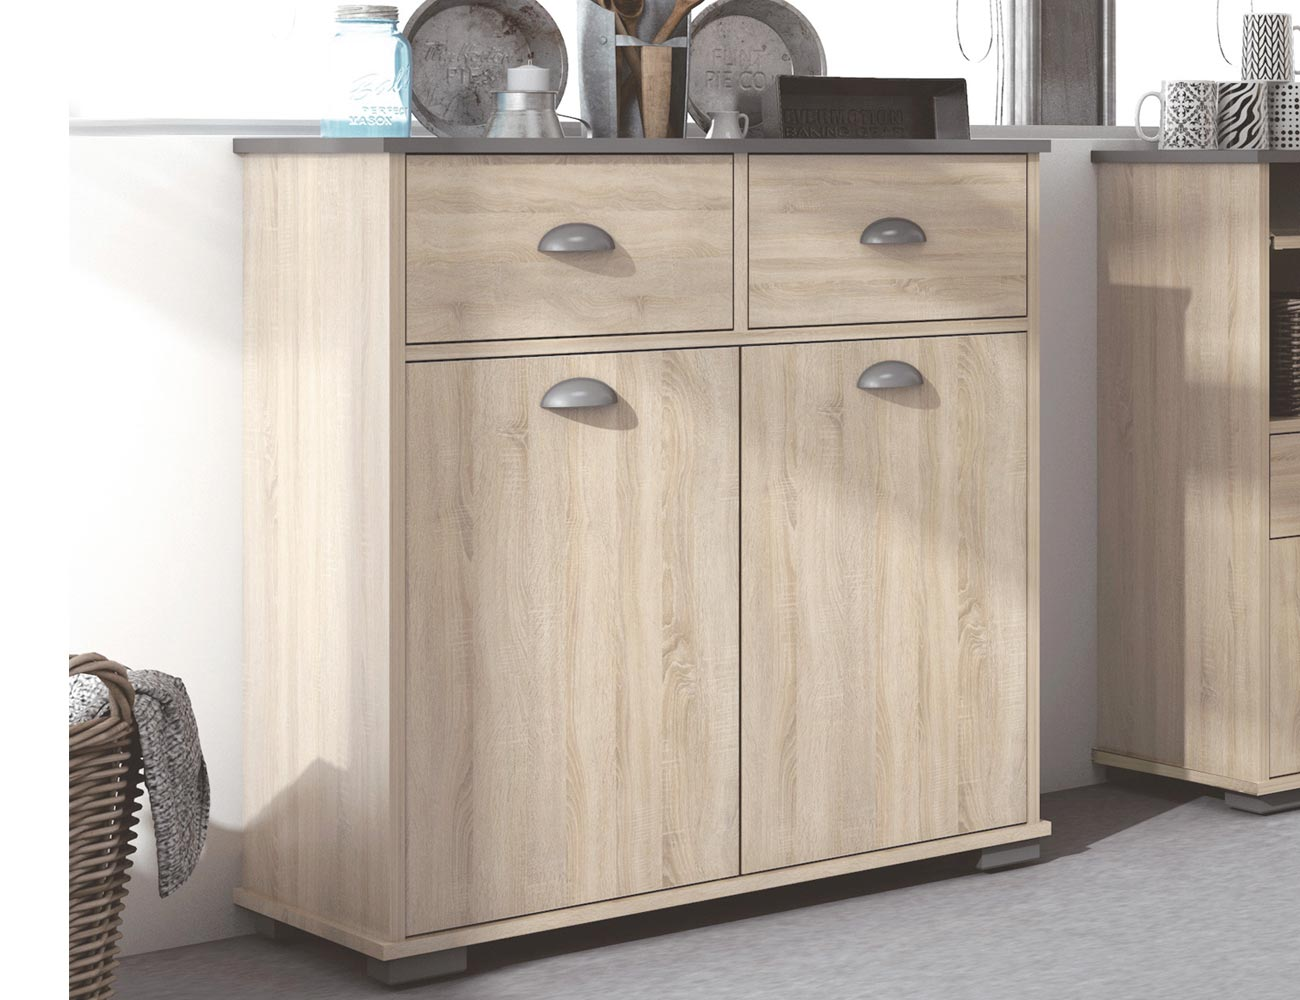 Mueble buffet de cocina de 90 cm de alto 21464 factory for Manual para muebles de cocina